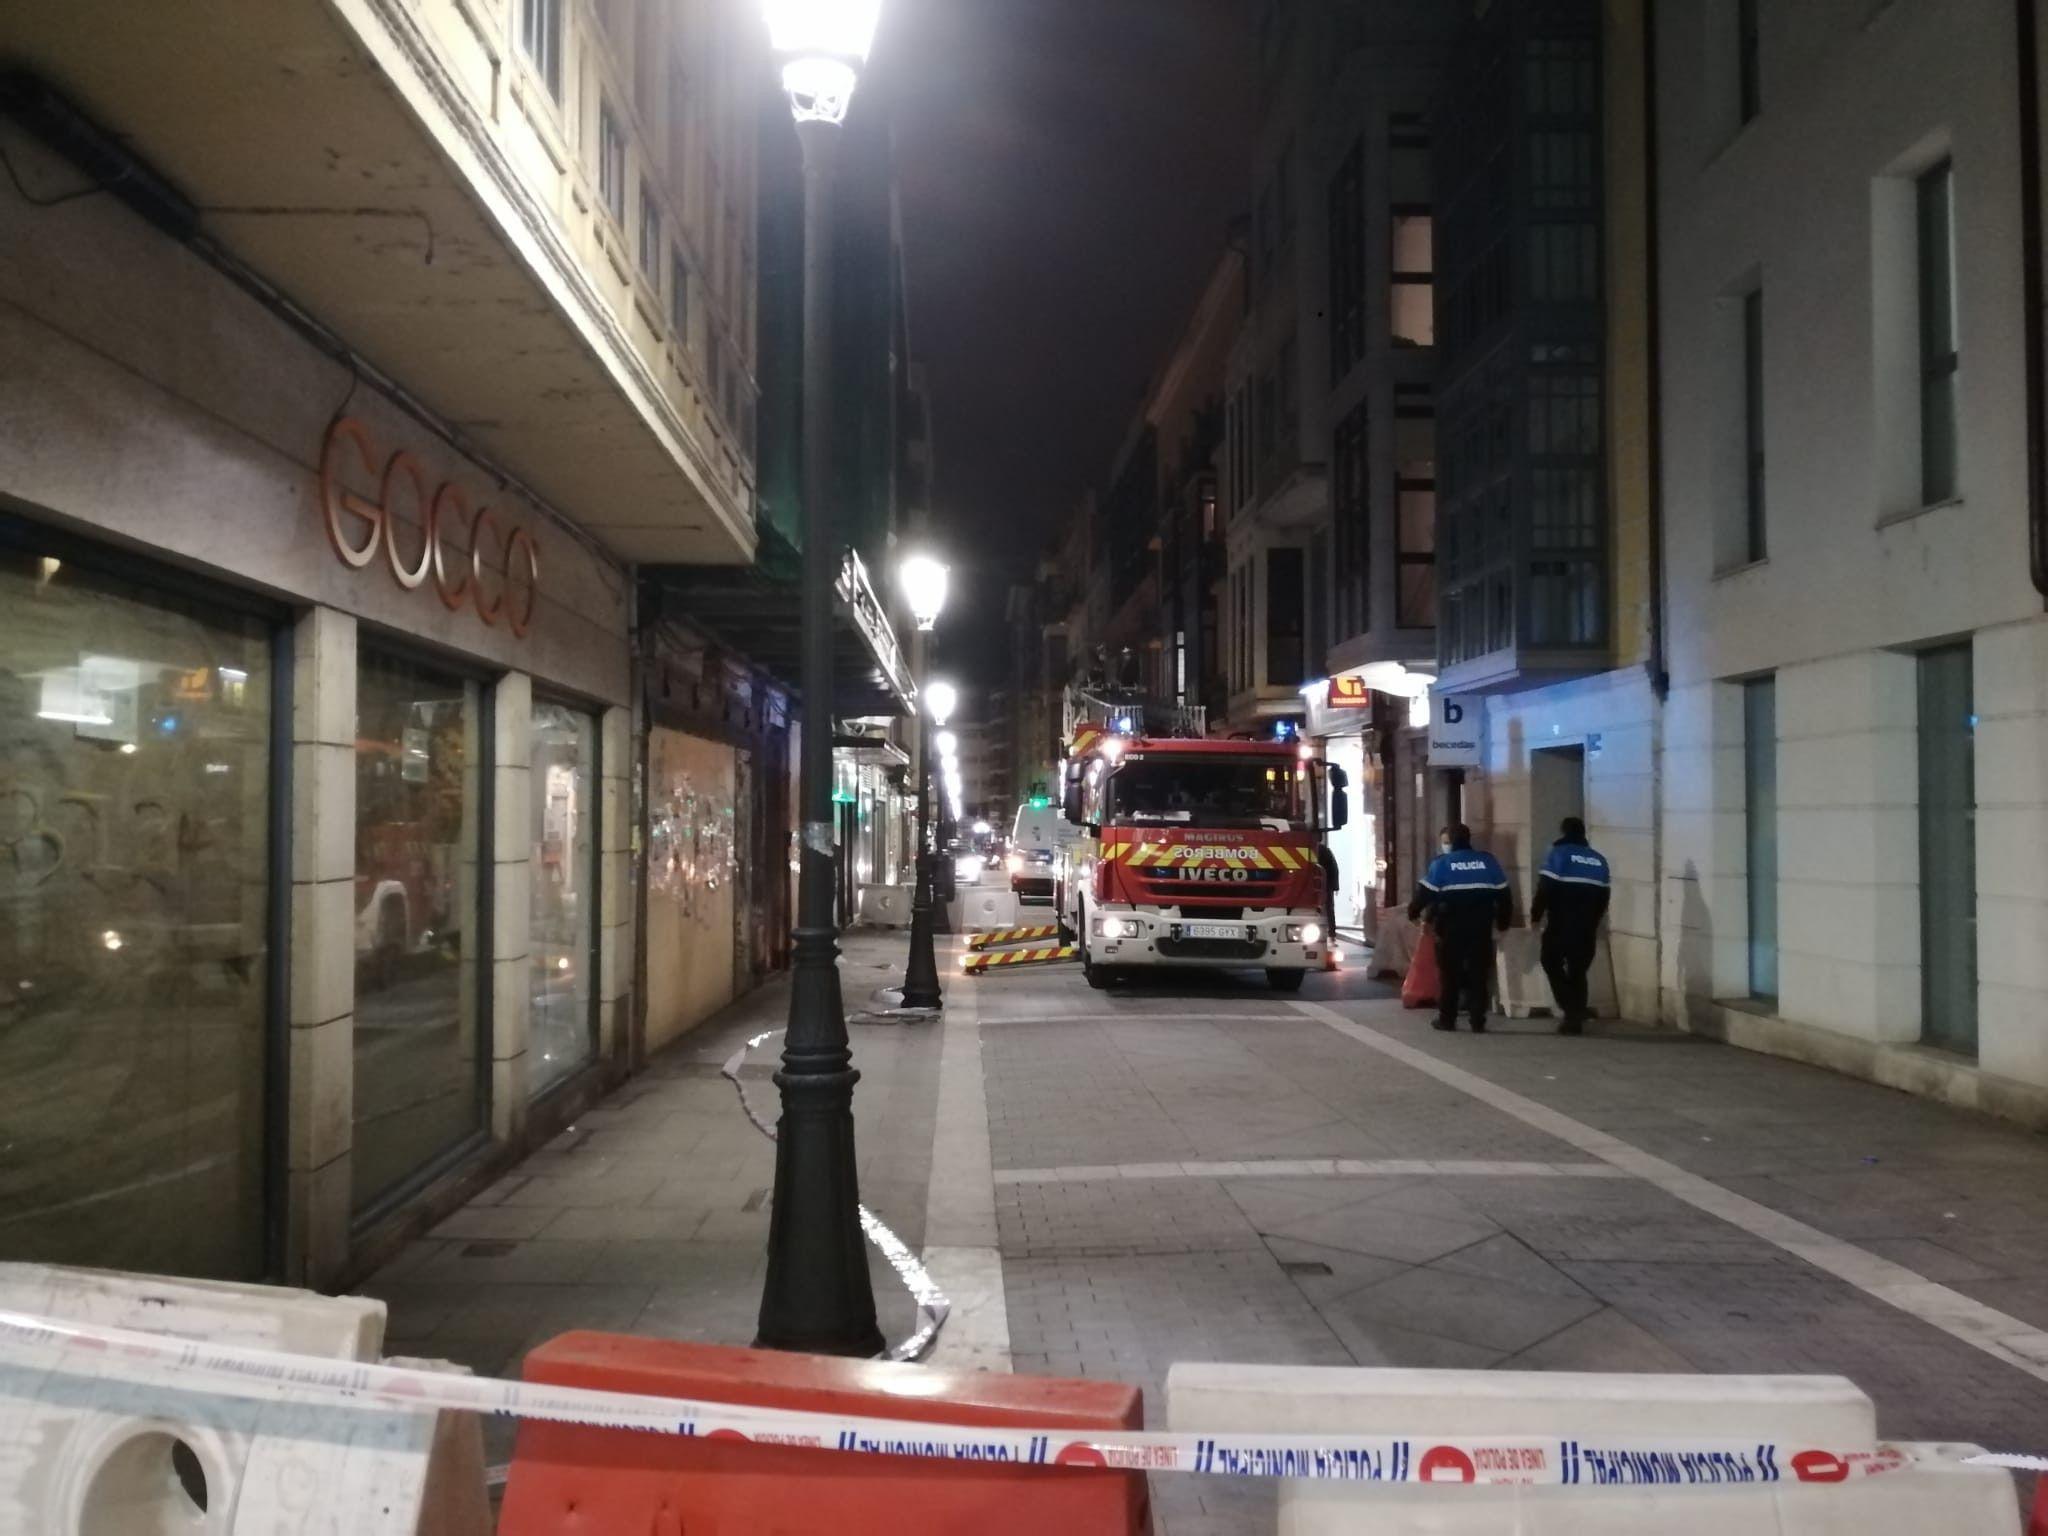 Desprendimientos bomberos san torcuato (1)